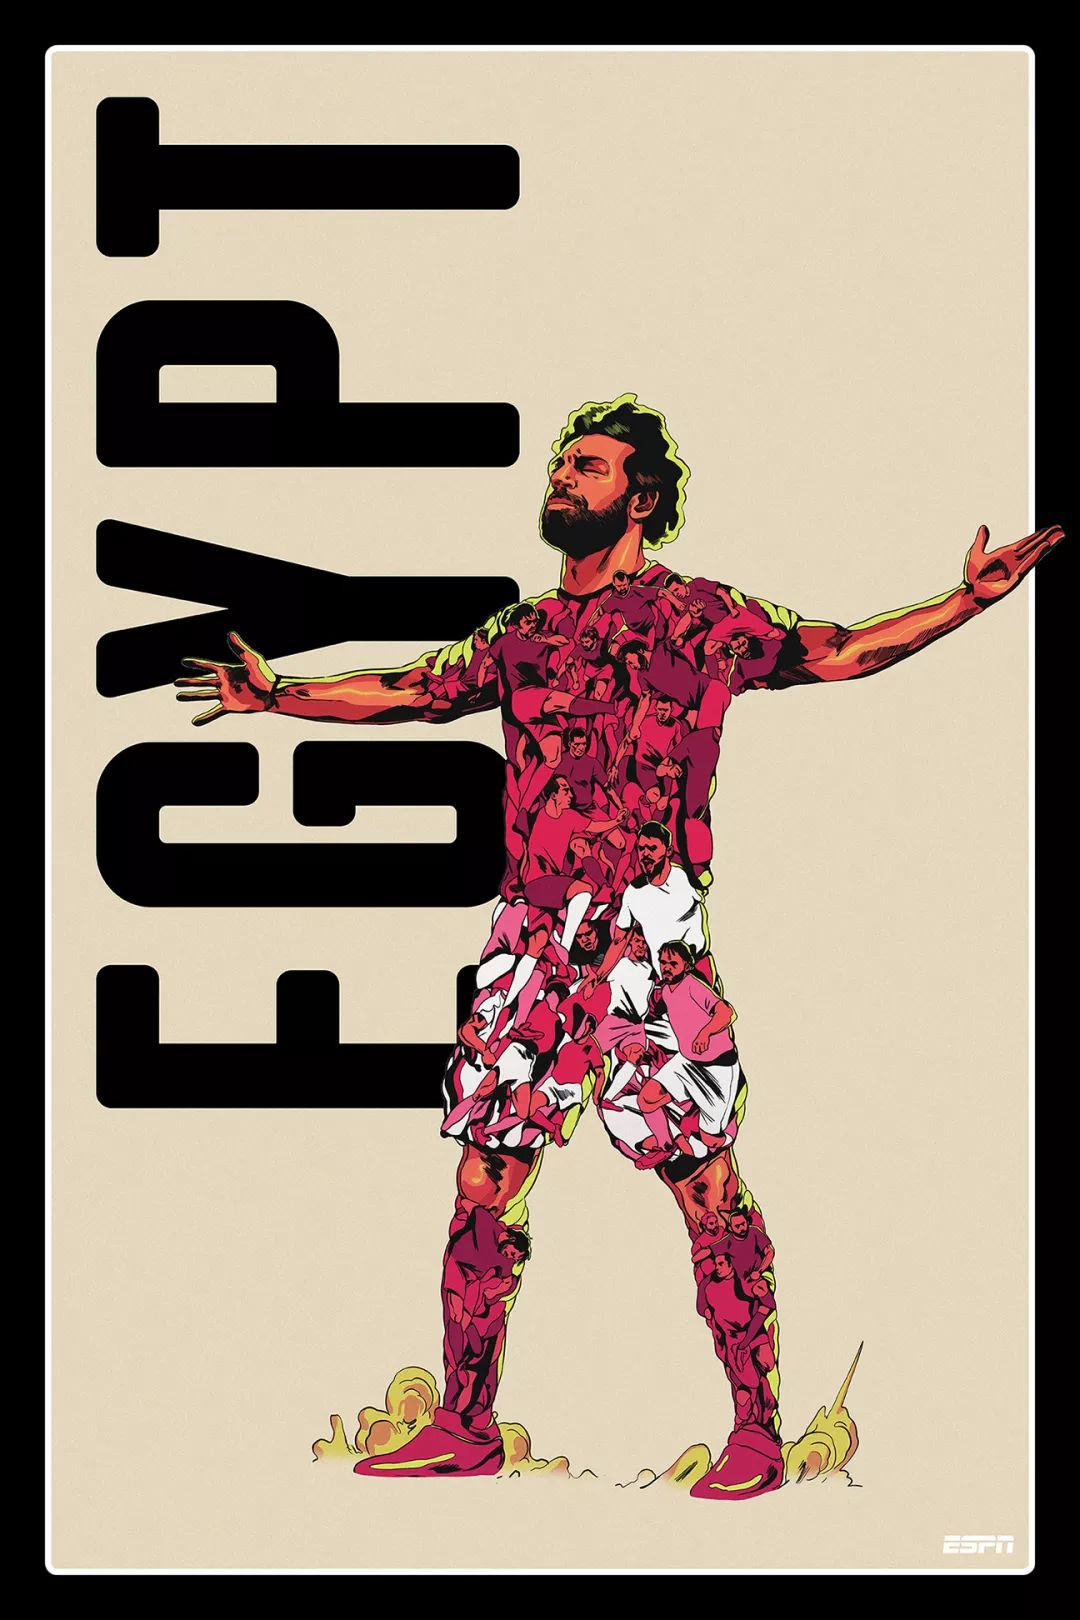 ESPN世界杯插画海报设计